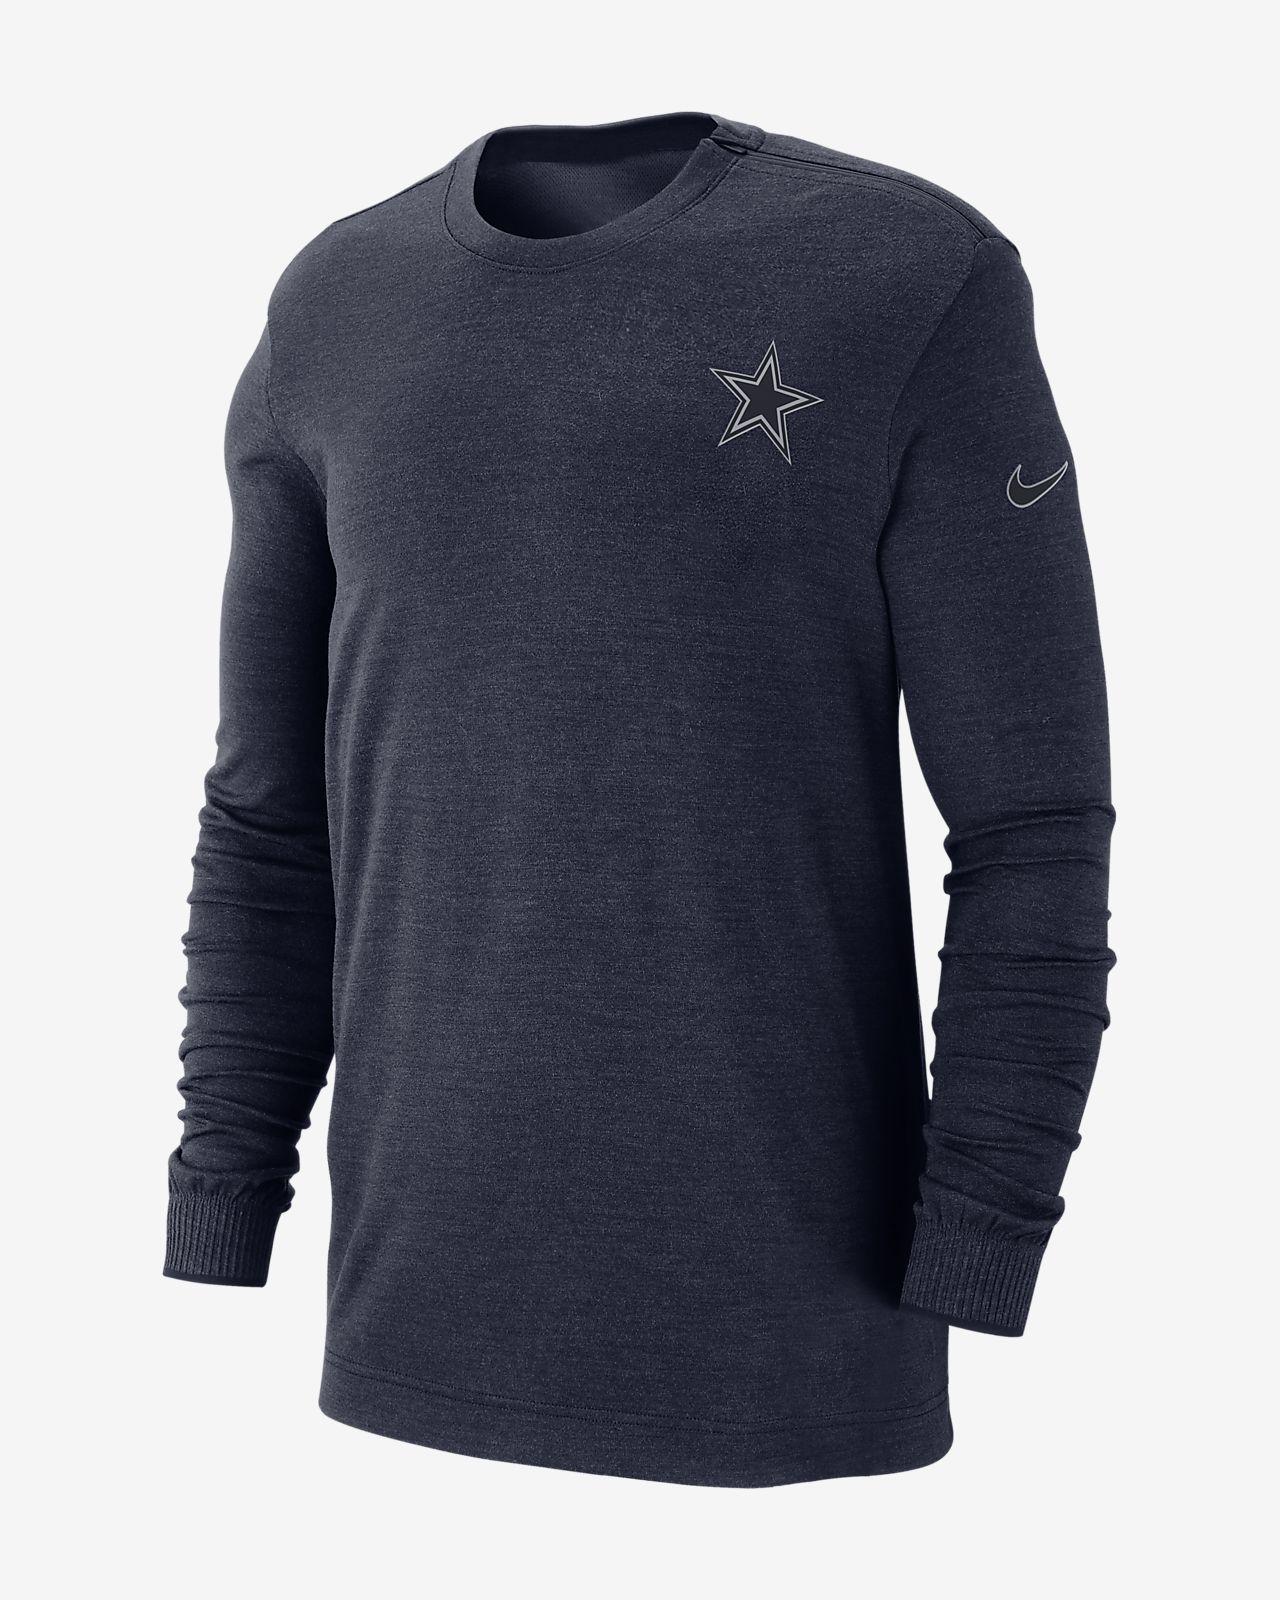 a8129335d64 Nike Sideline Coach (NFL Cowboys) Men's Long Sleeve Top. Nike.com